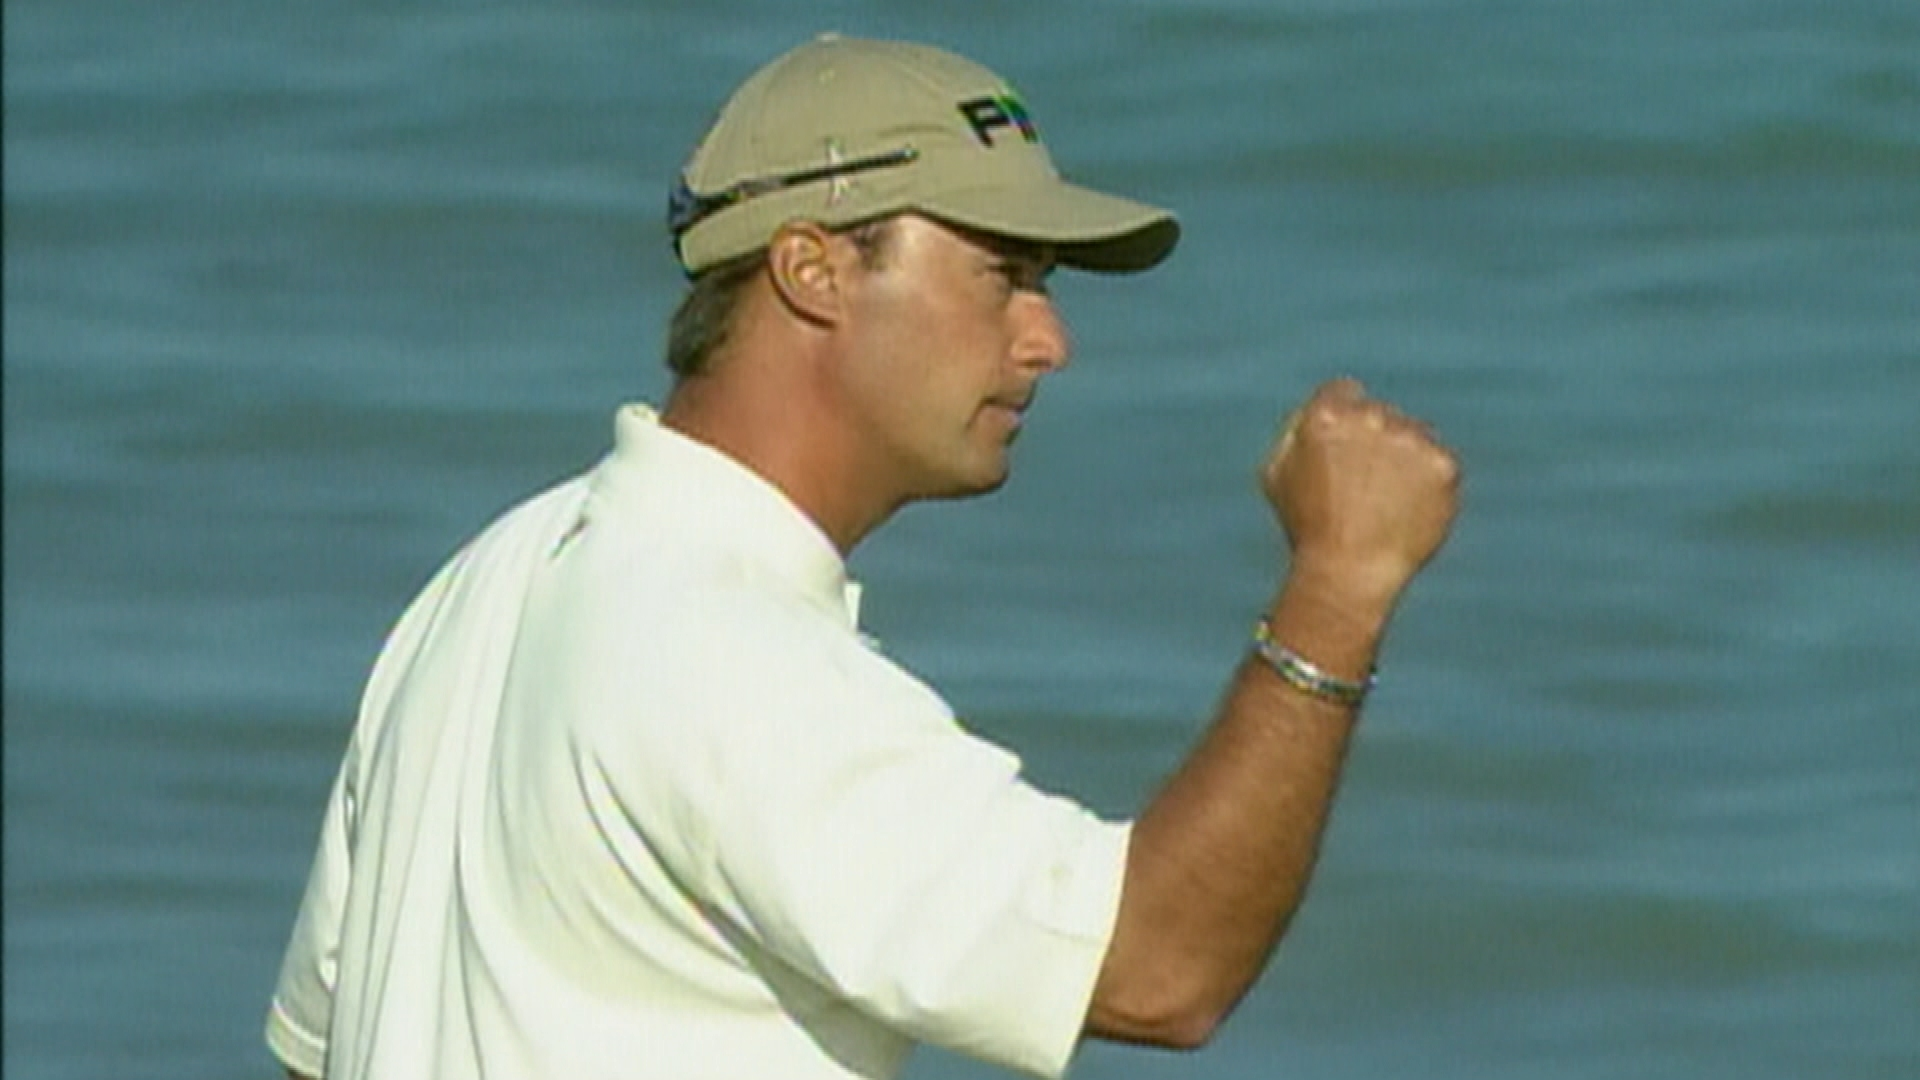 afbf387469b http   www.golfchannel.com media guid 0ccbb881-ed27-4420-b529 ...